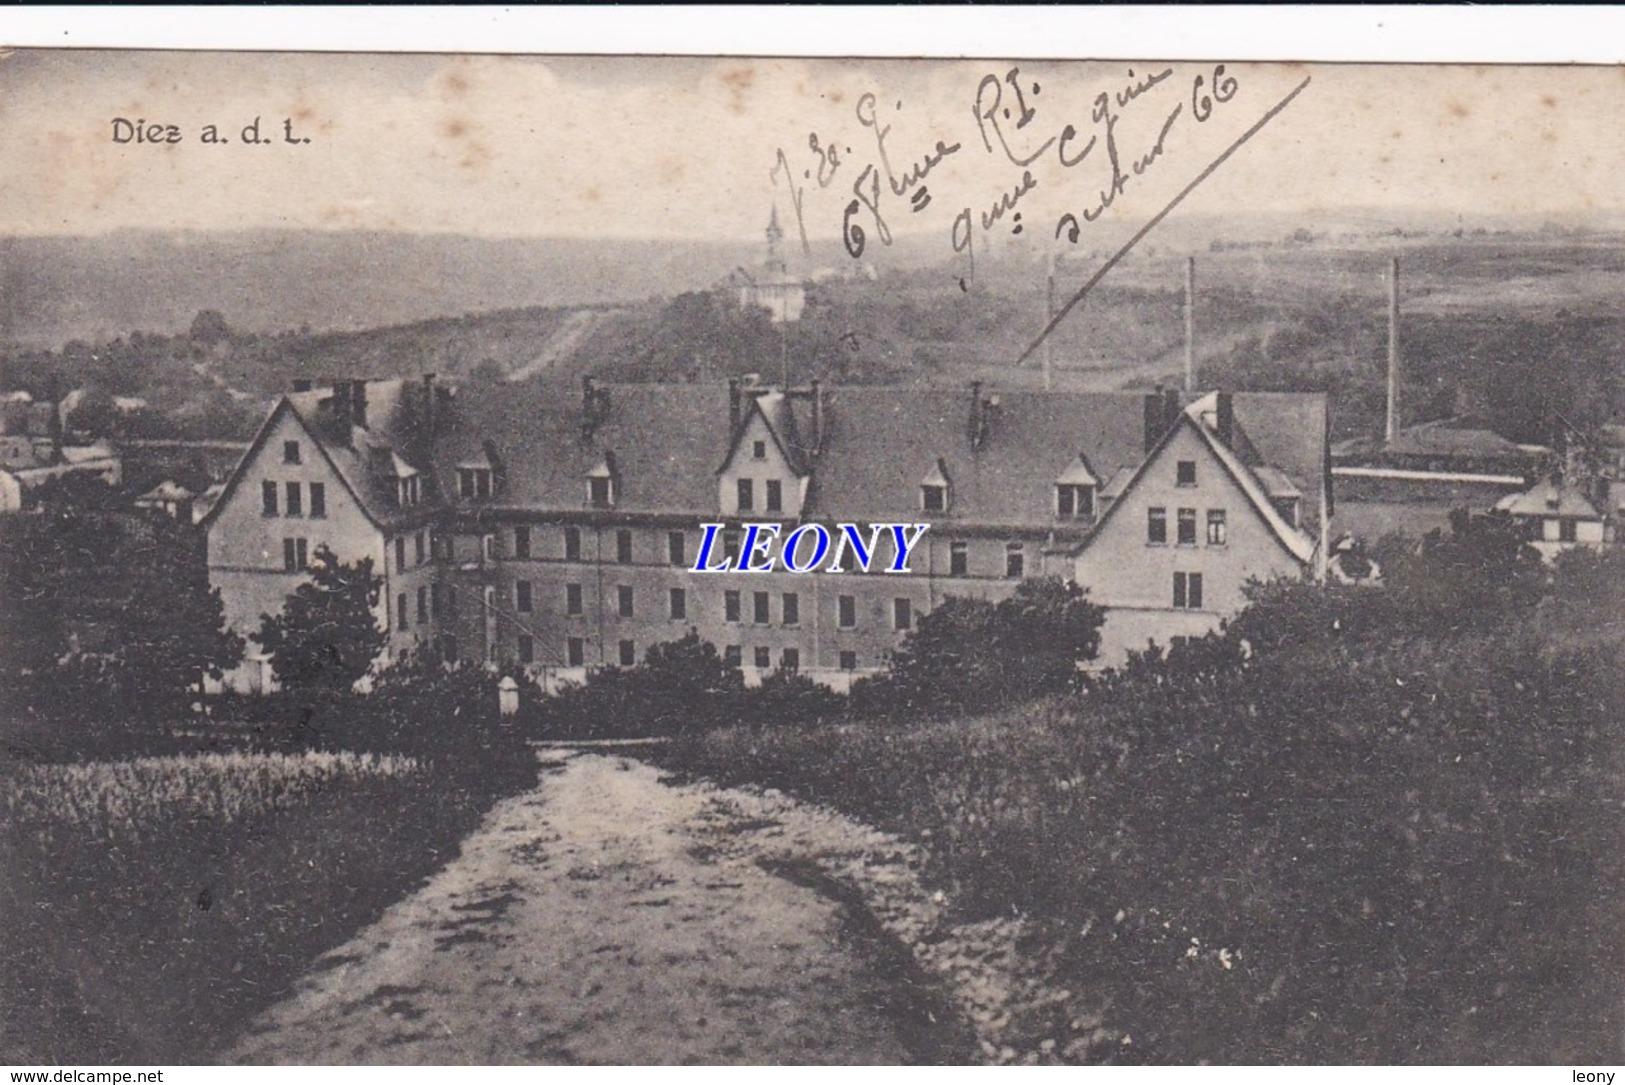 CPA D' ALLEMAGNE - DIEZ A. D. L. 1919 - Diez